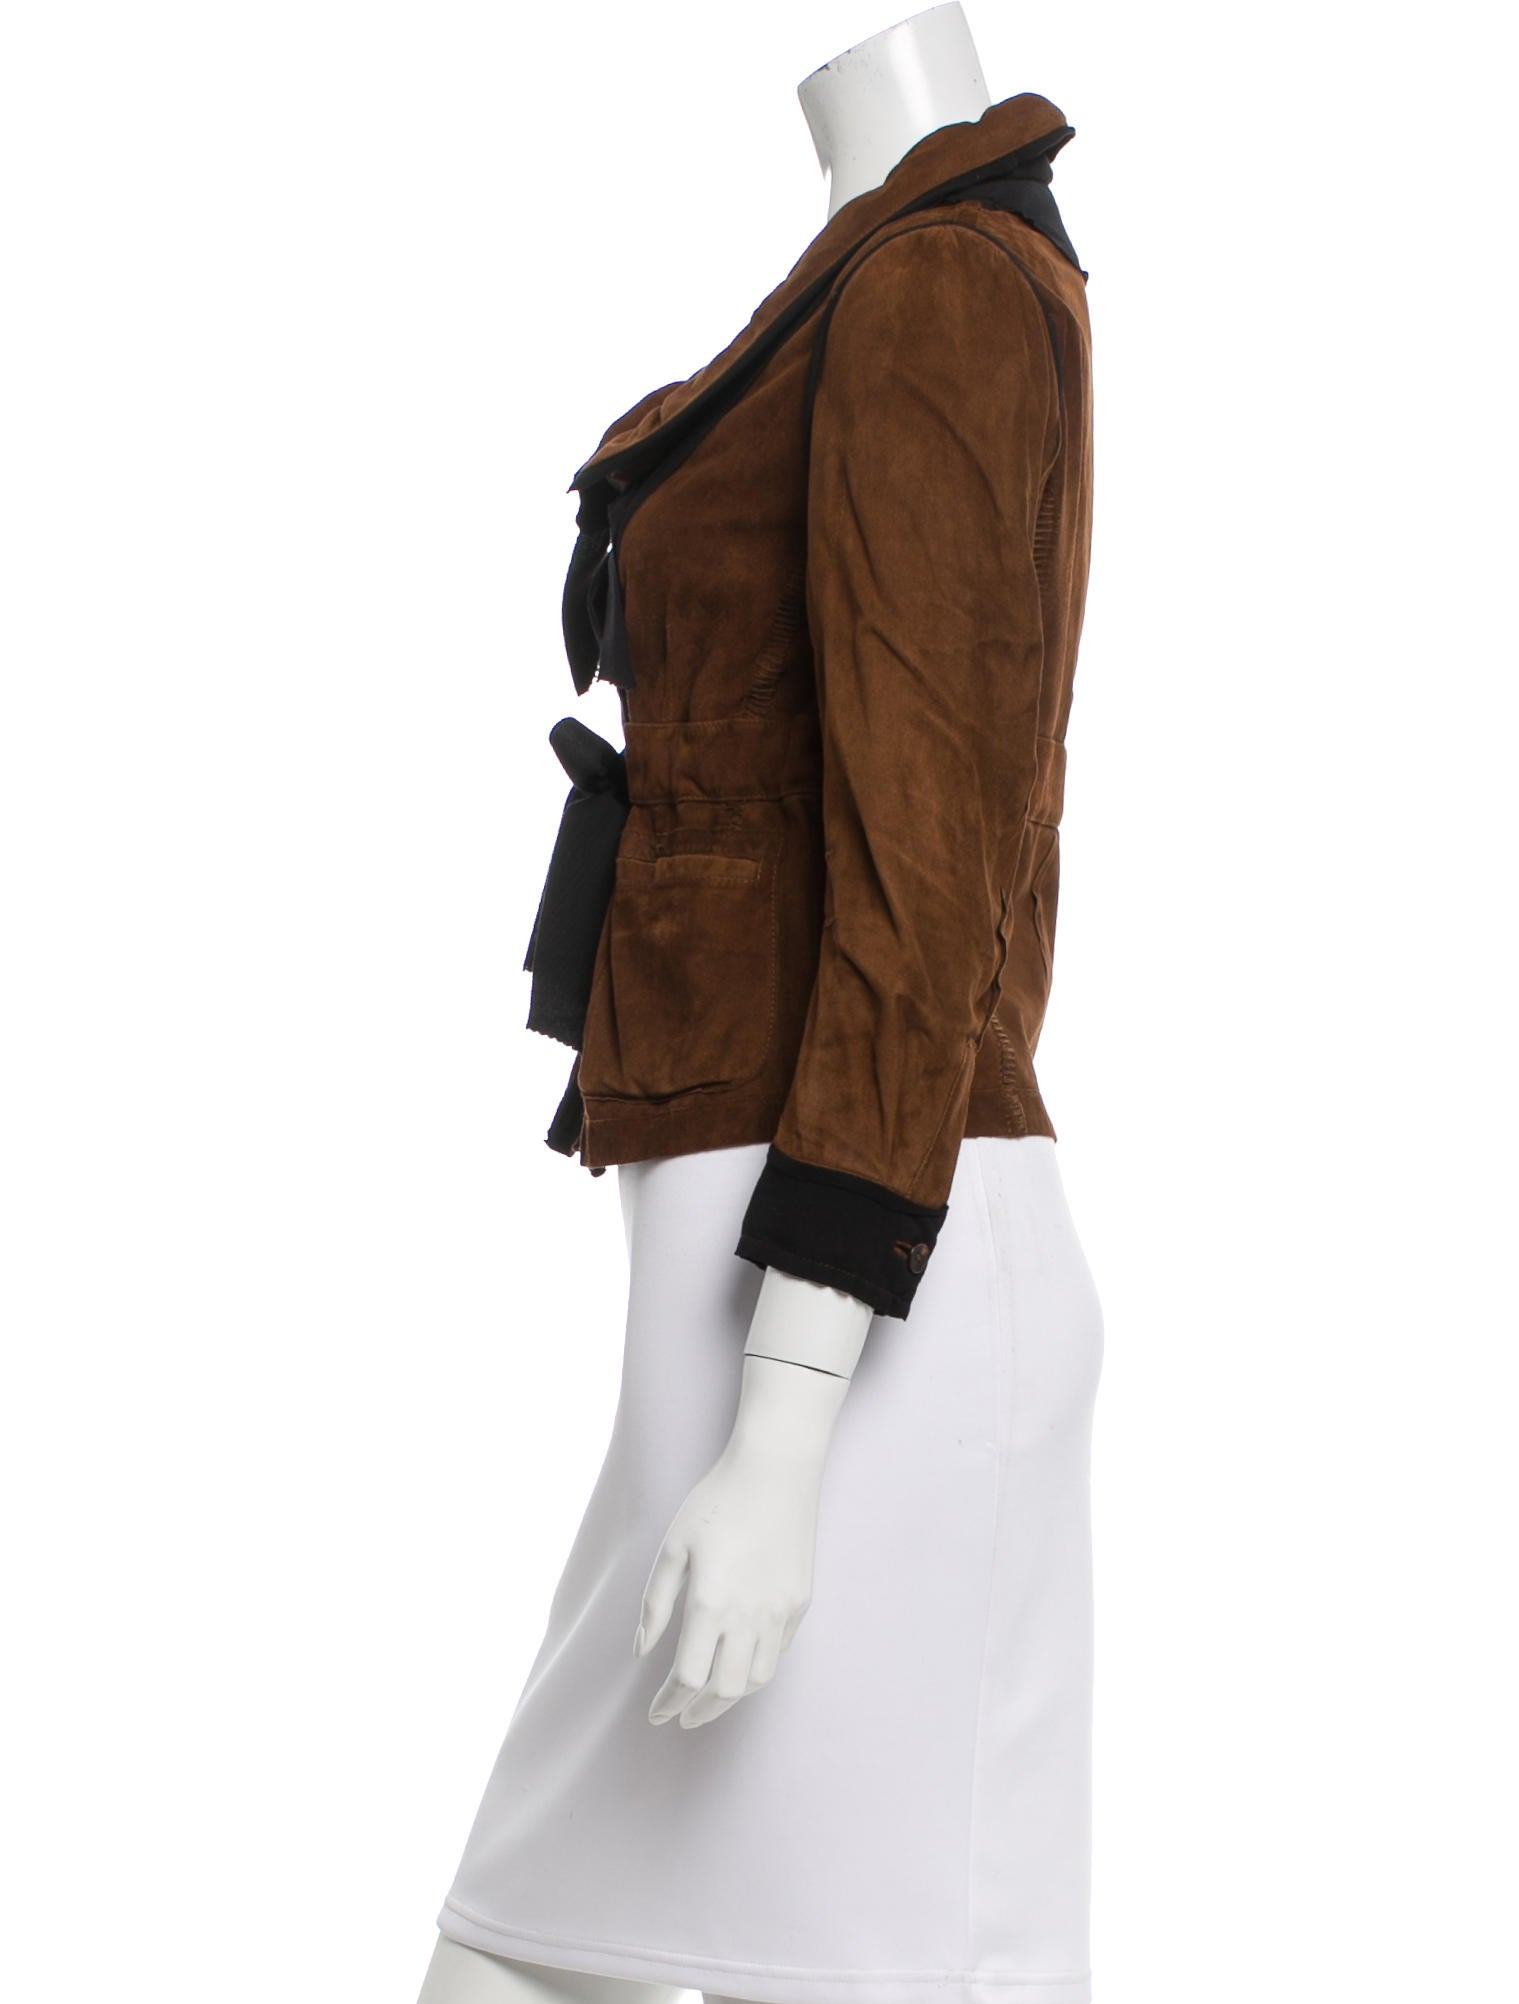 Donna Karan Suede Pointed Collar Jacket Clothing